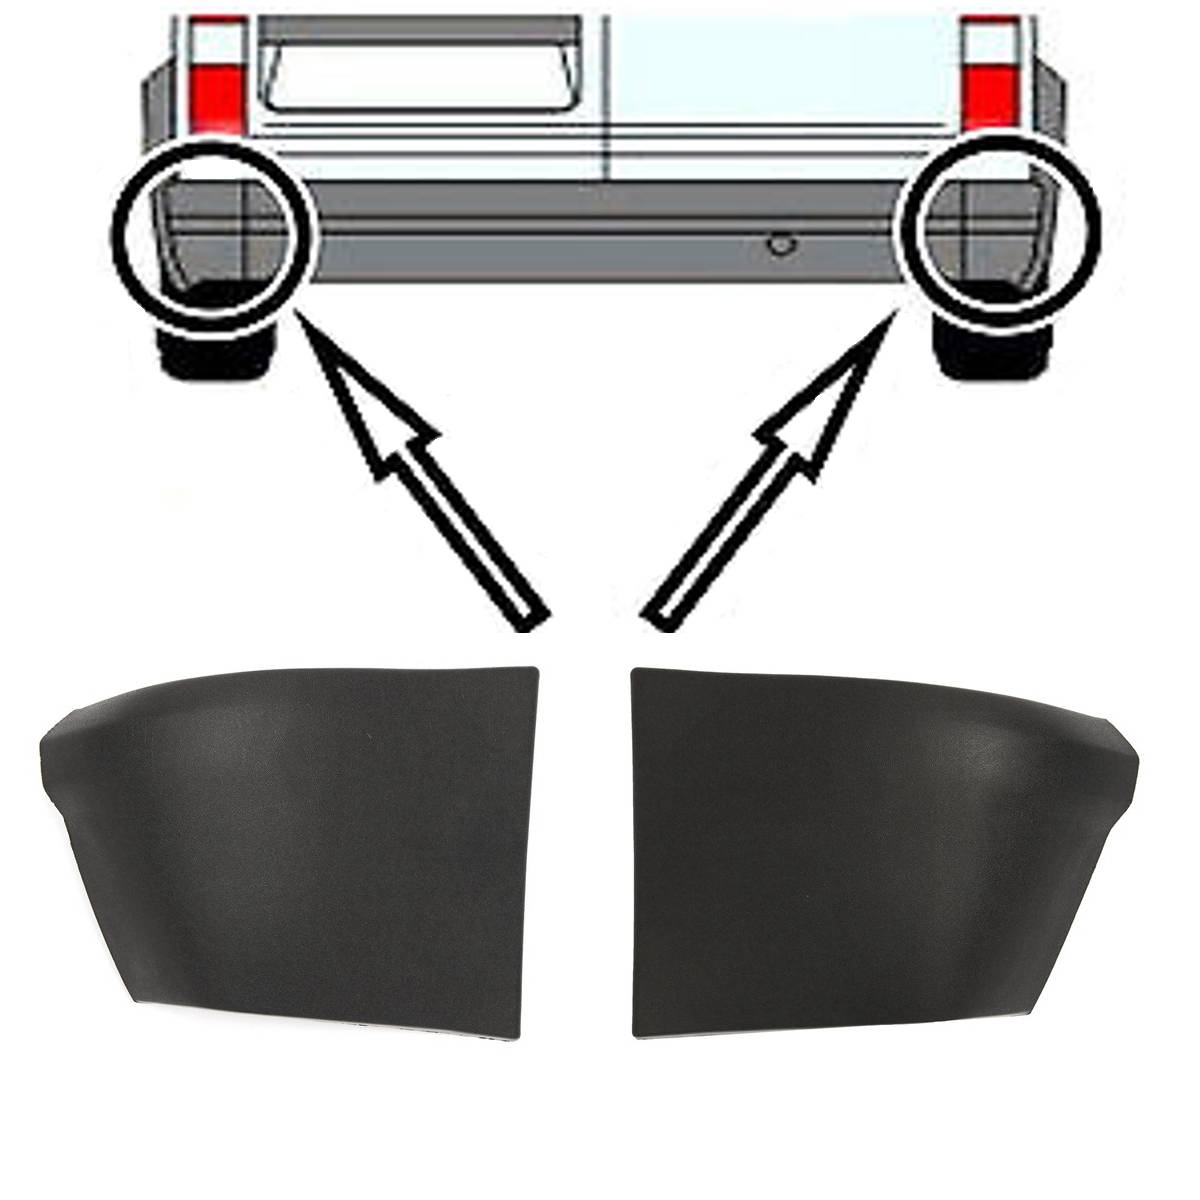 Transit Parts Transit Connect Rear Bumper Trim Cover /& 2 End Caps New New